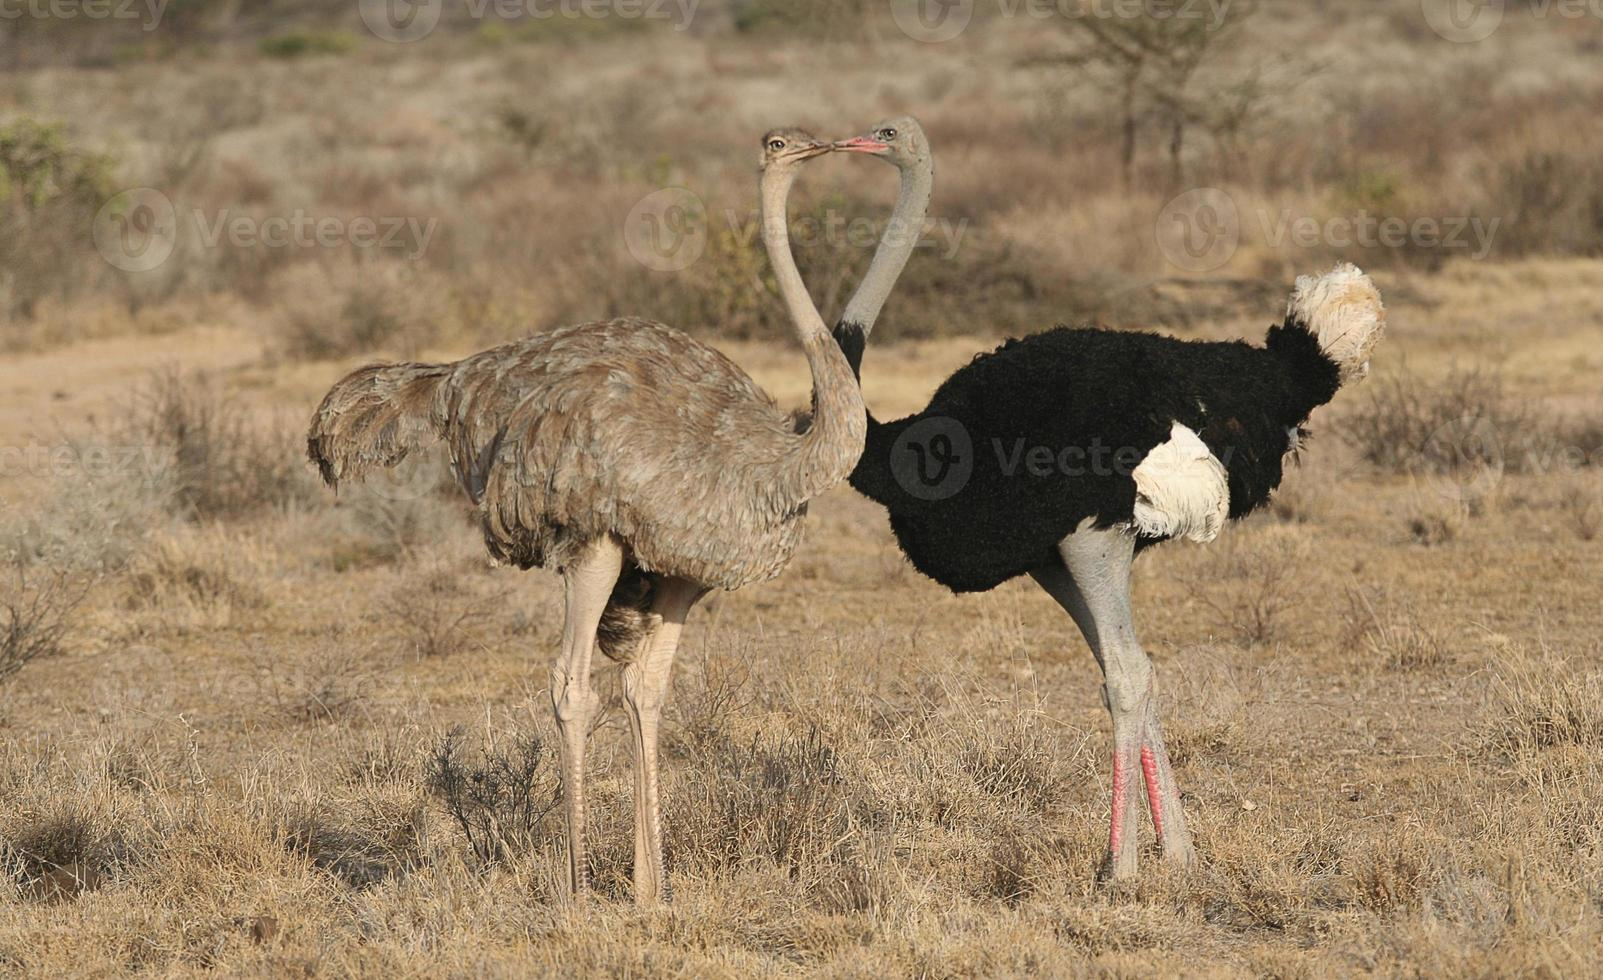 Avestruces besándose - avestruz somalí, struthio molubdophanes, buffalo springs, kenia foto